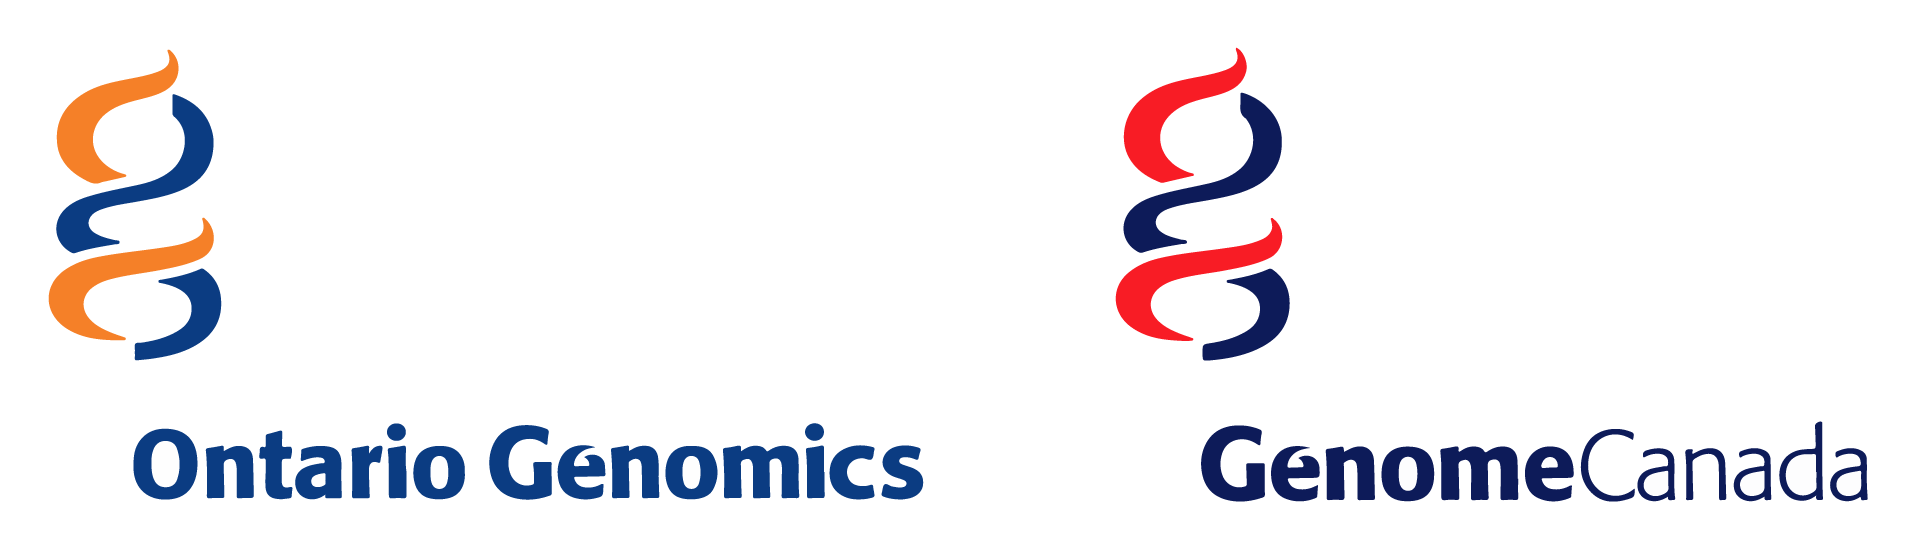 GAPP_logos.png